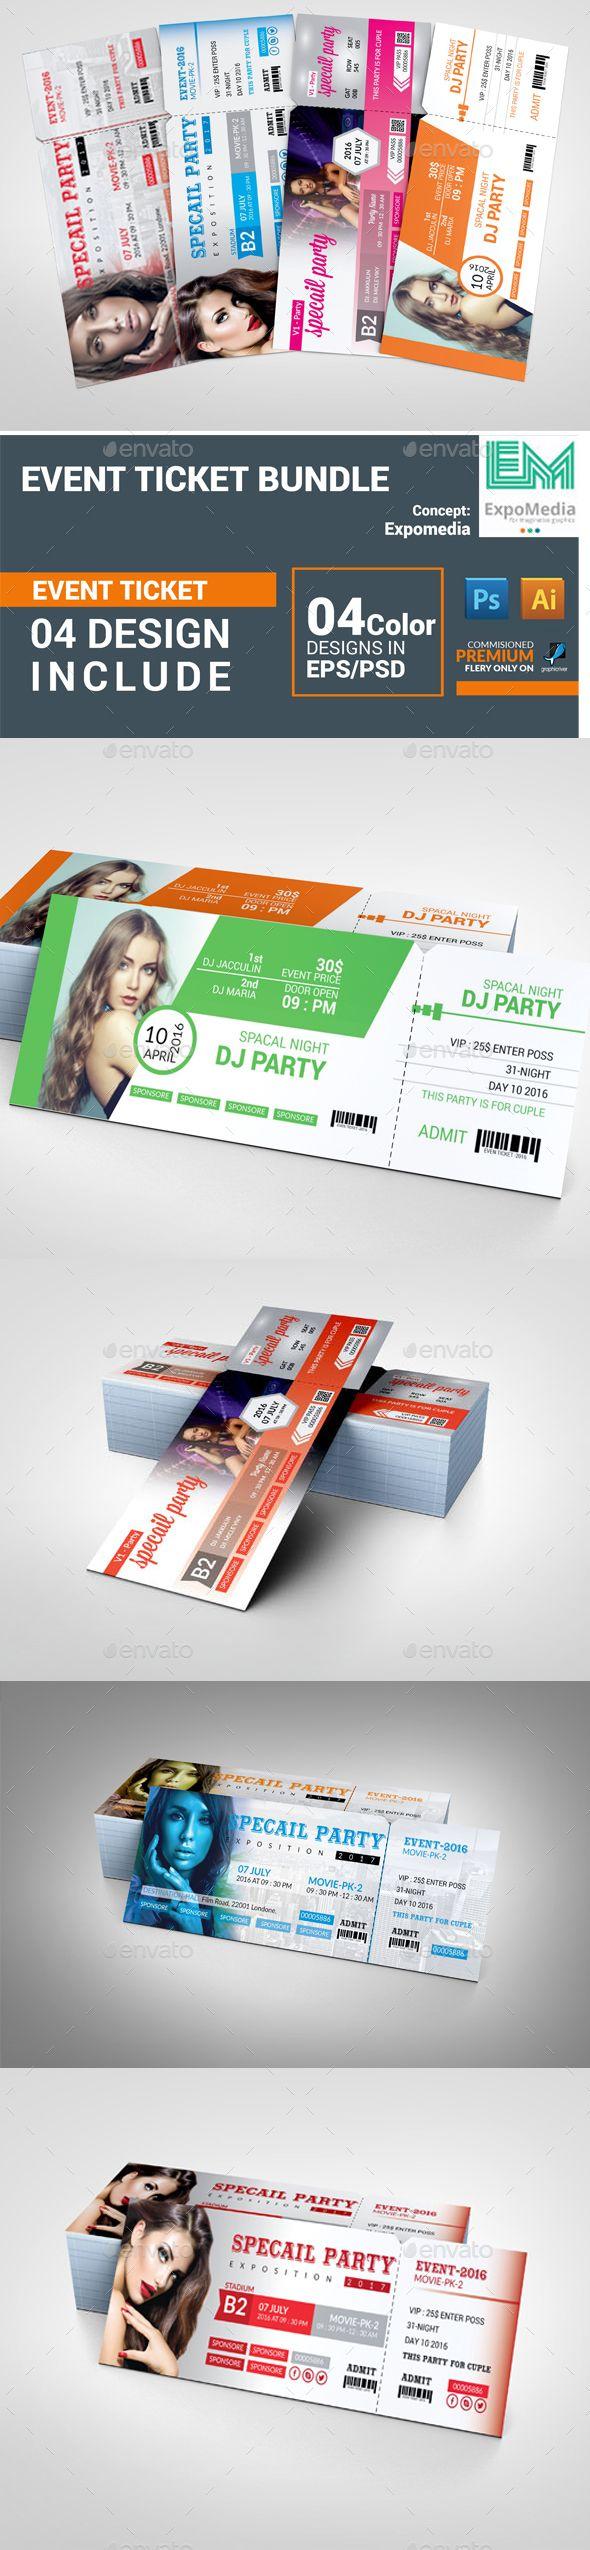 Event Ticket Bundle  — PSD Template #three color #concert • Download ➝ https://graphicriver.net/item/event-ticket-bundle/18427781?ref=pxcr